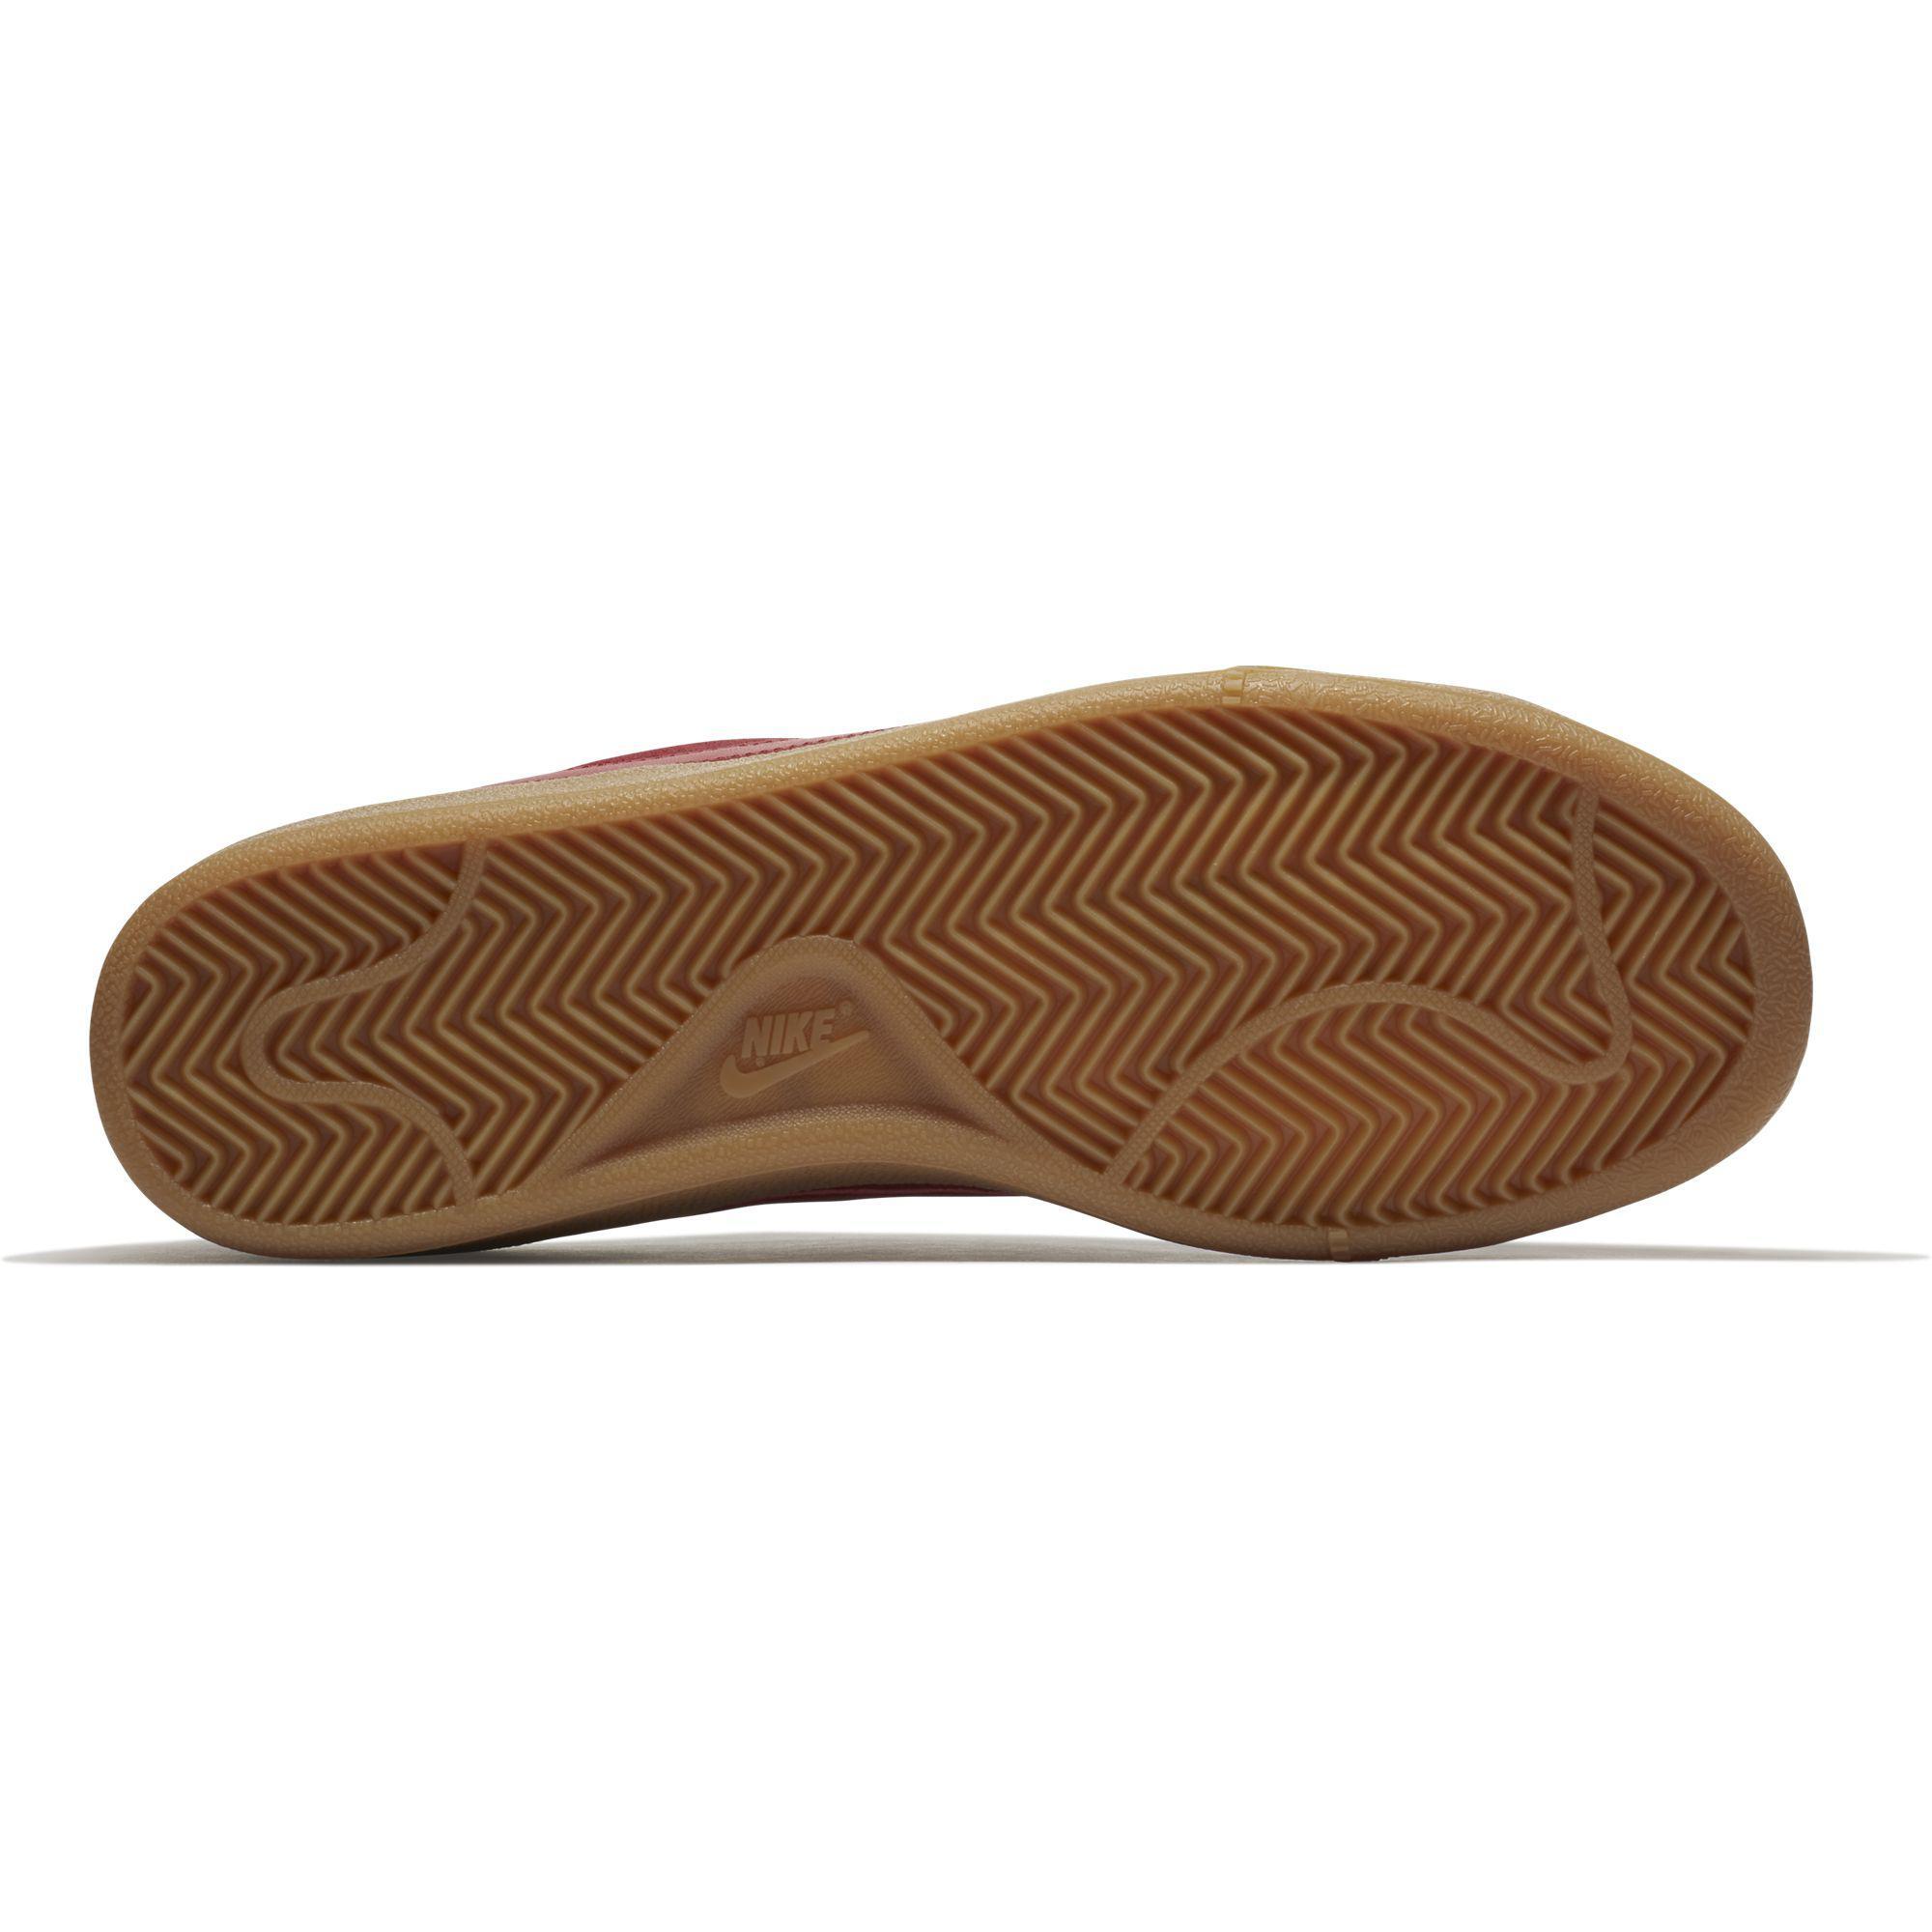 84d6df51eb0d4a Nike Mens Court Royale Suede Tennis Shoes - Red - Tennisnuts.com